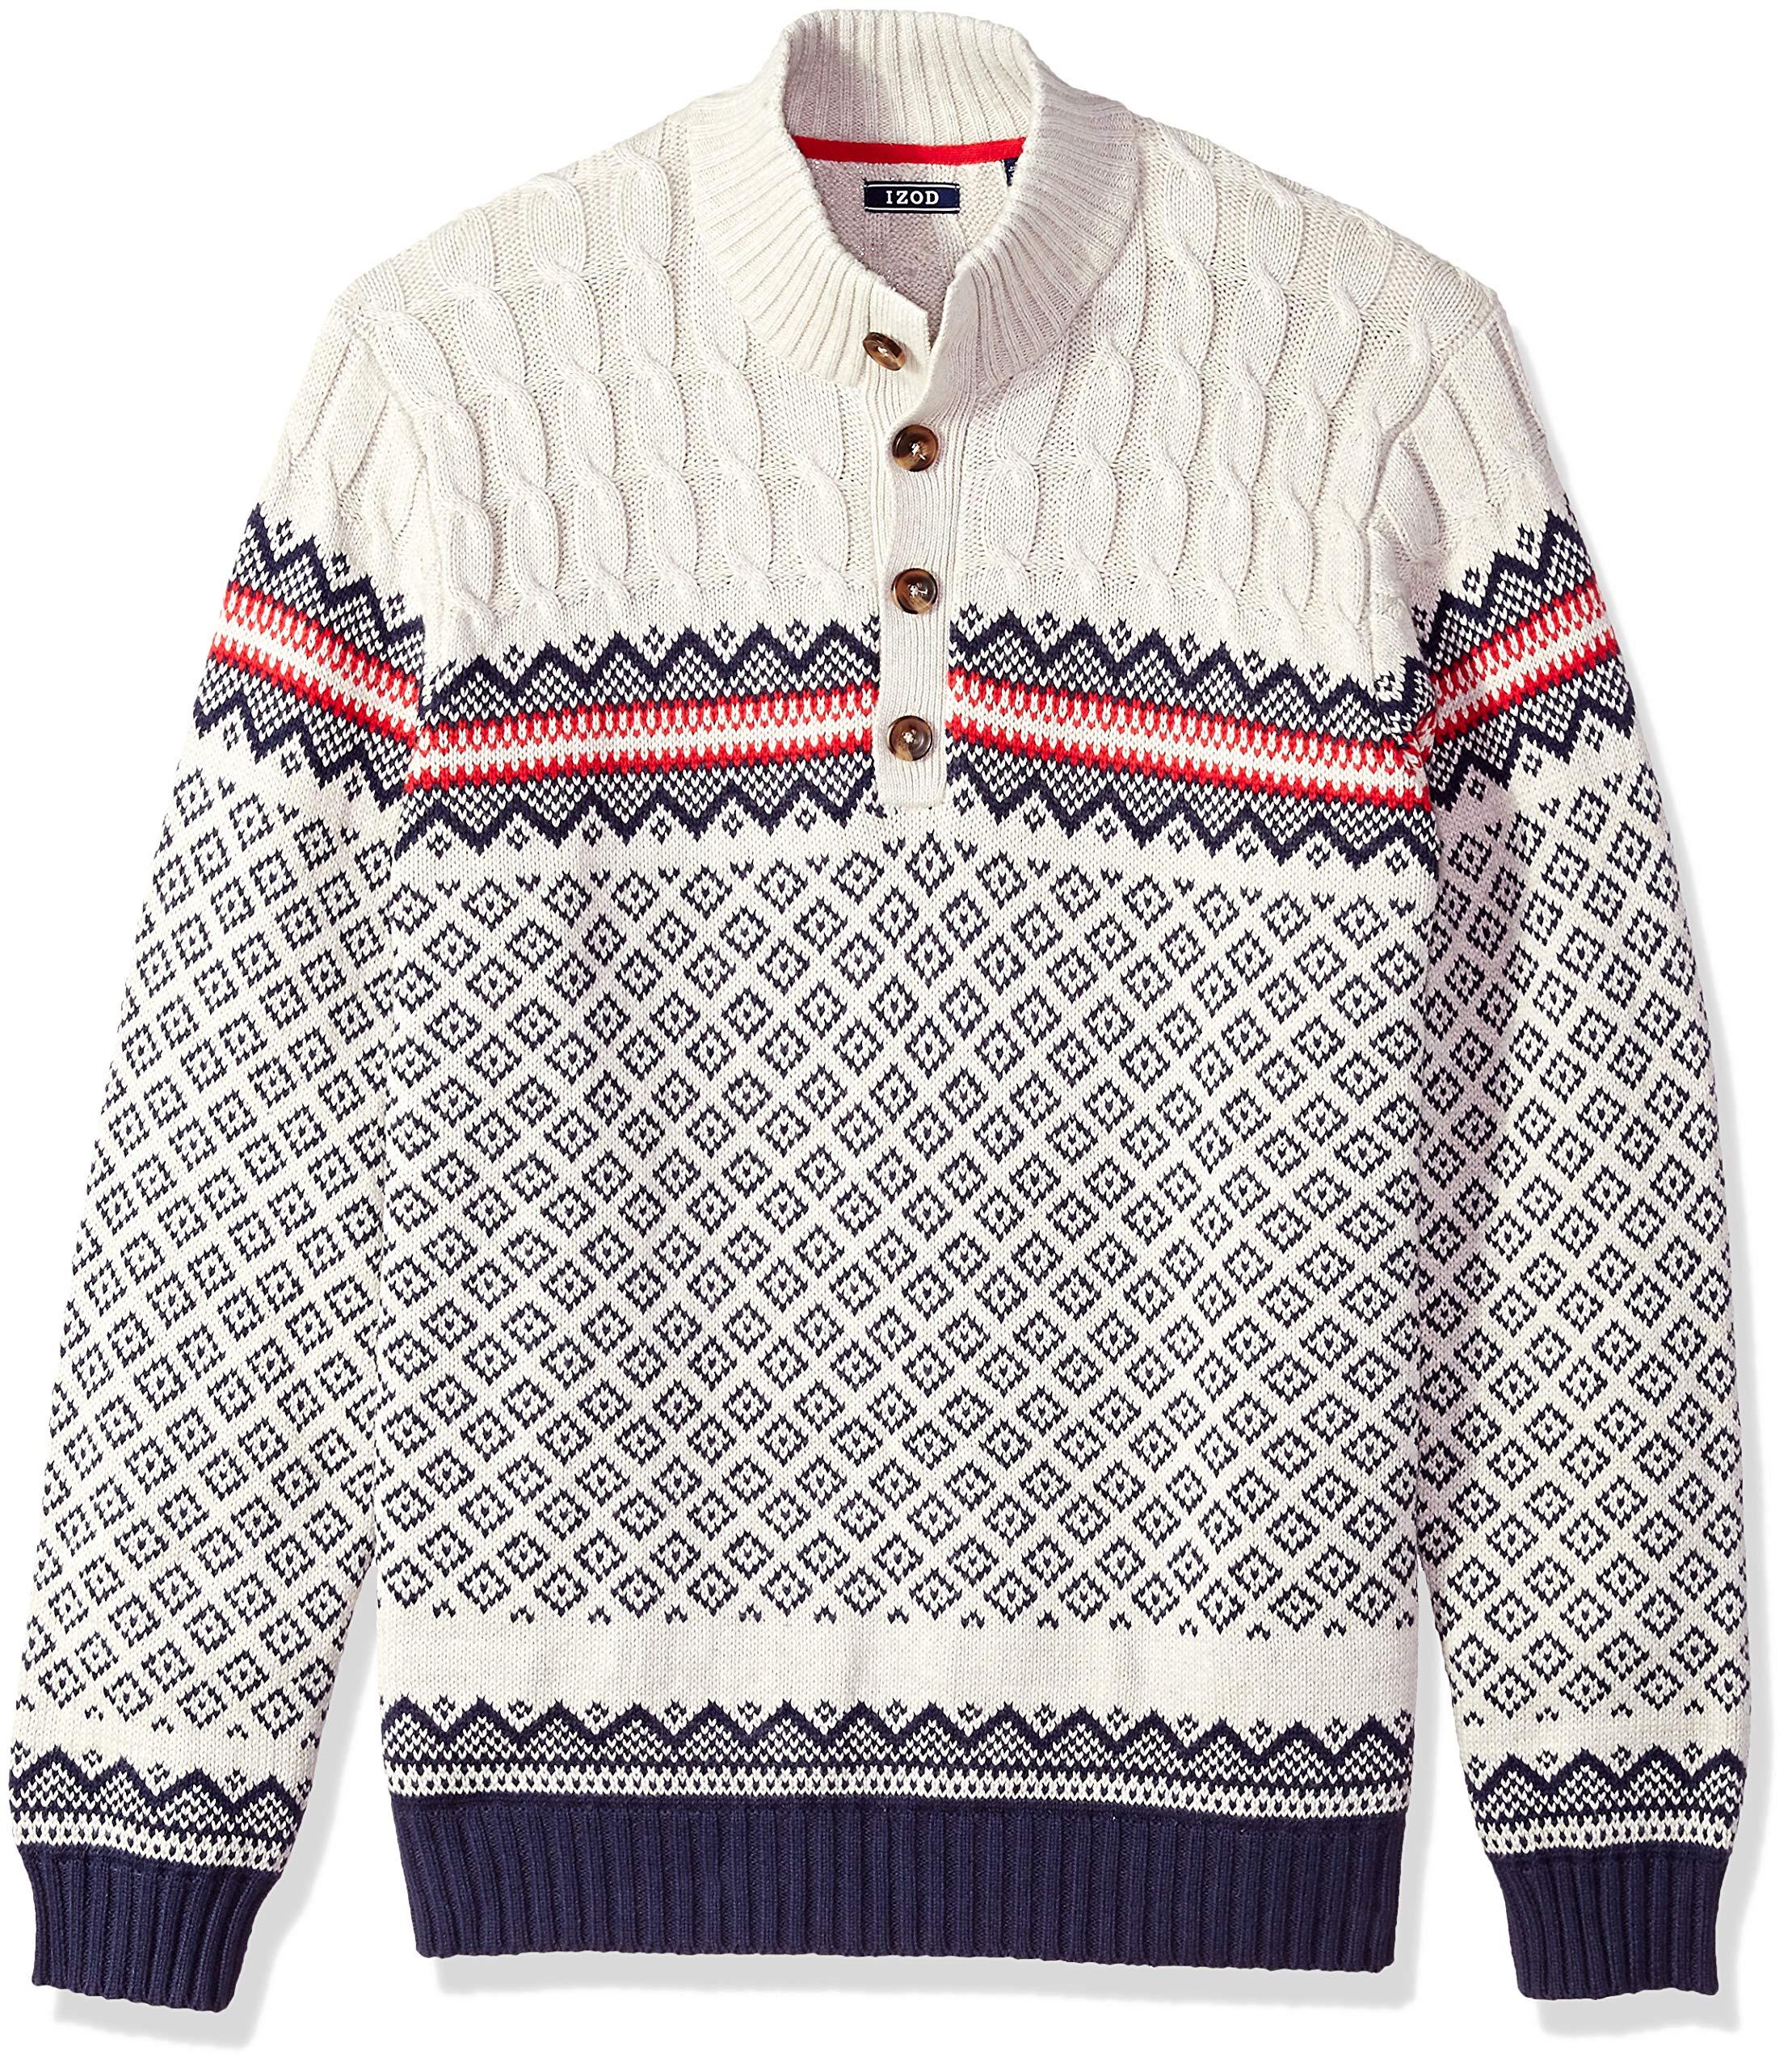 IZOD Men's Big and Tall Fairisle Buttoned Mock Neck 5 Gauge Sweater, Edifice Heather, 3X-Large